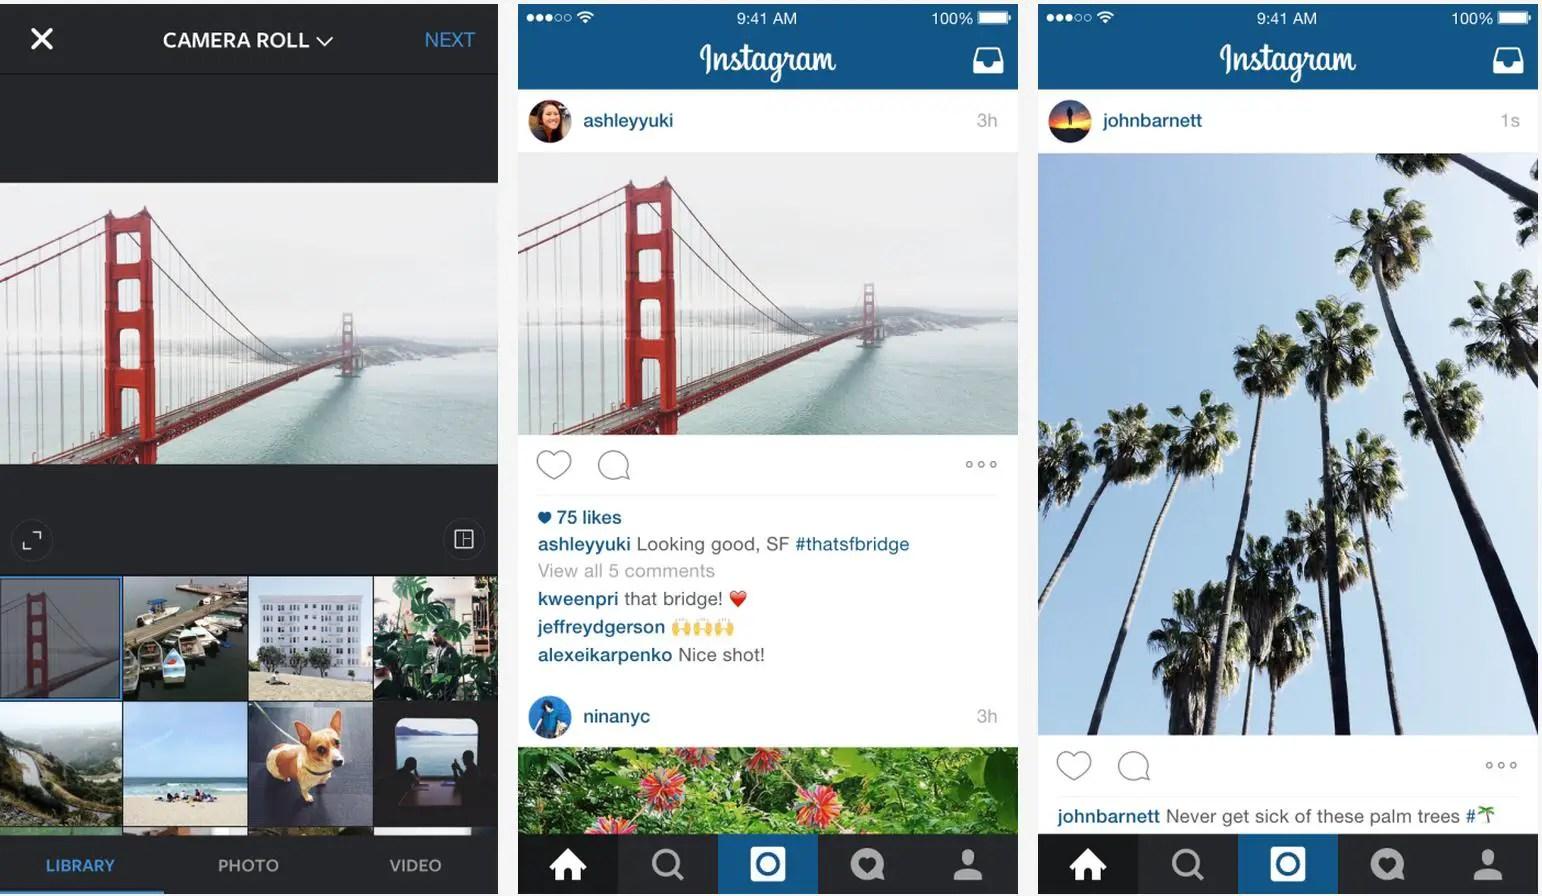 wersm Instagram Leaves Behind Squared Images